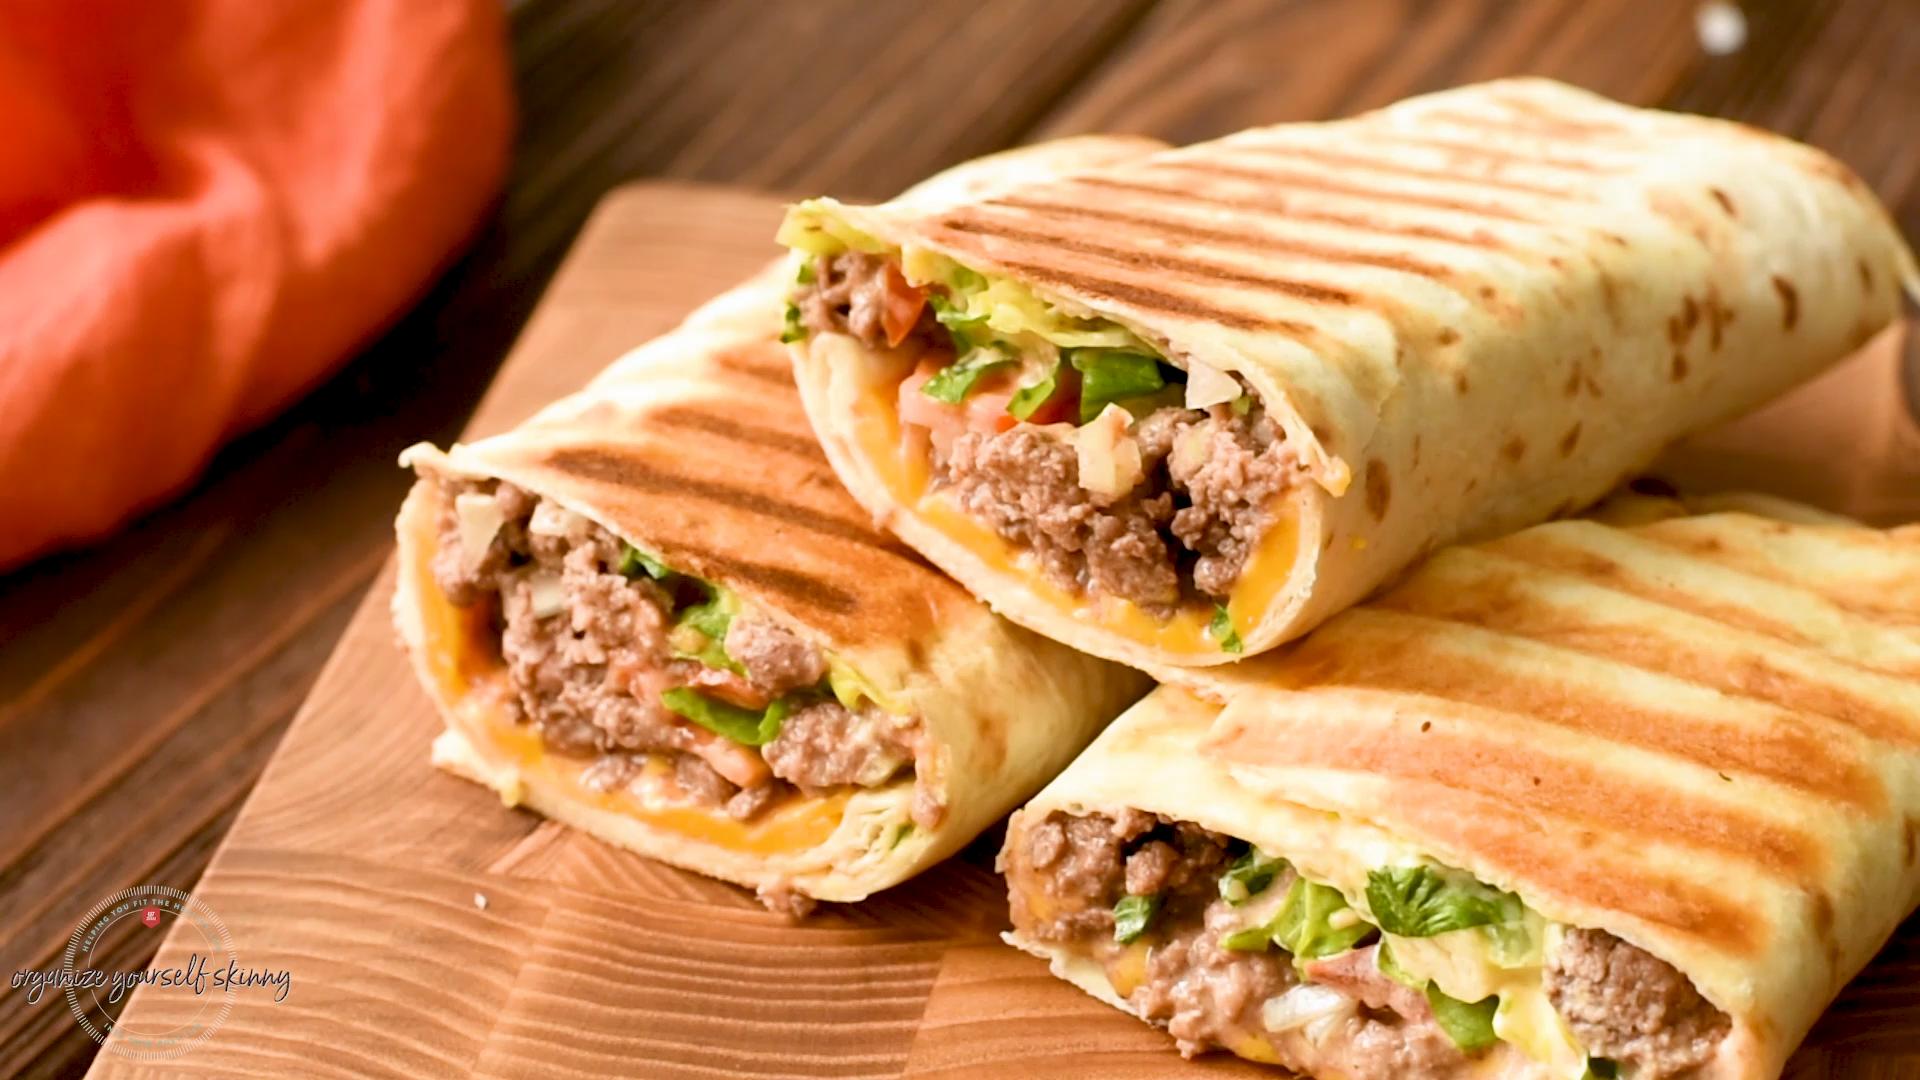 Healthy Cheeseburger Wrap Sandwich Recipe | Easy Meal Prep Recipes